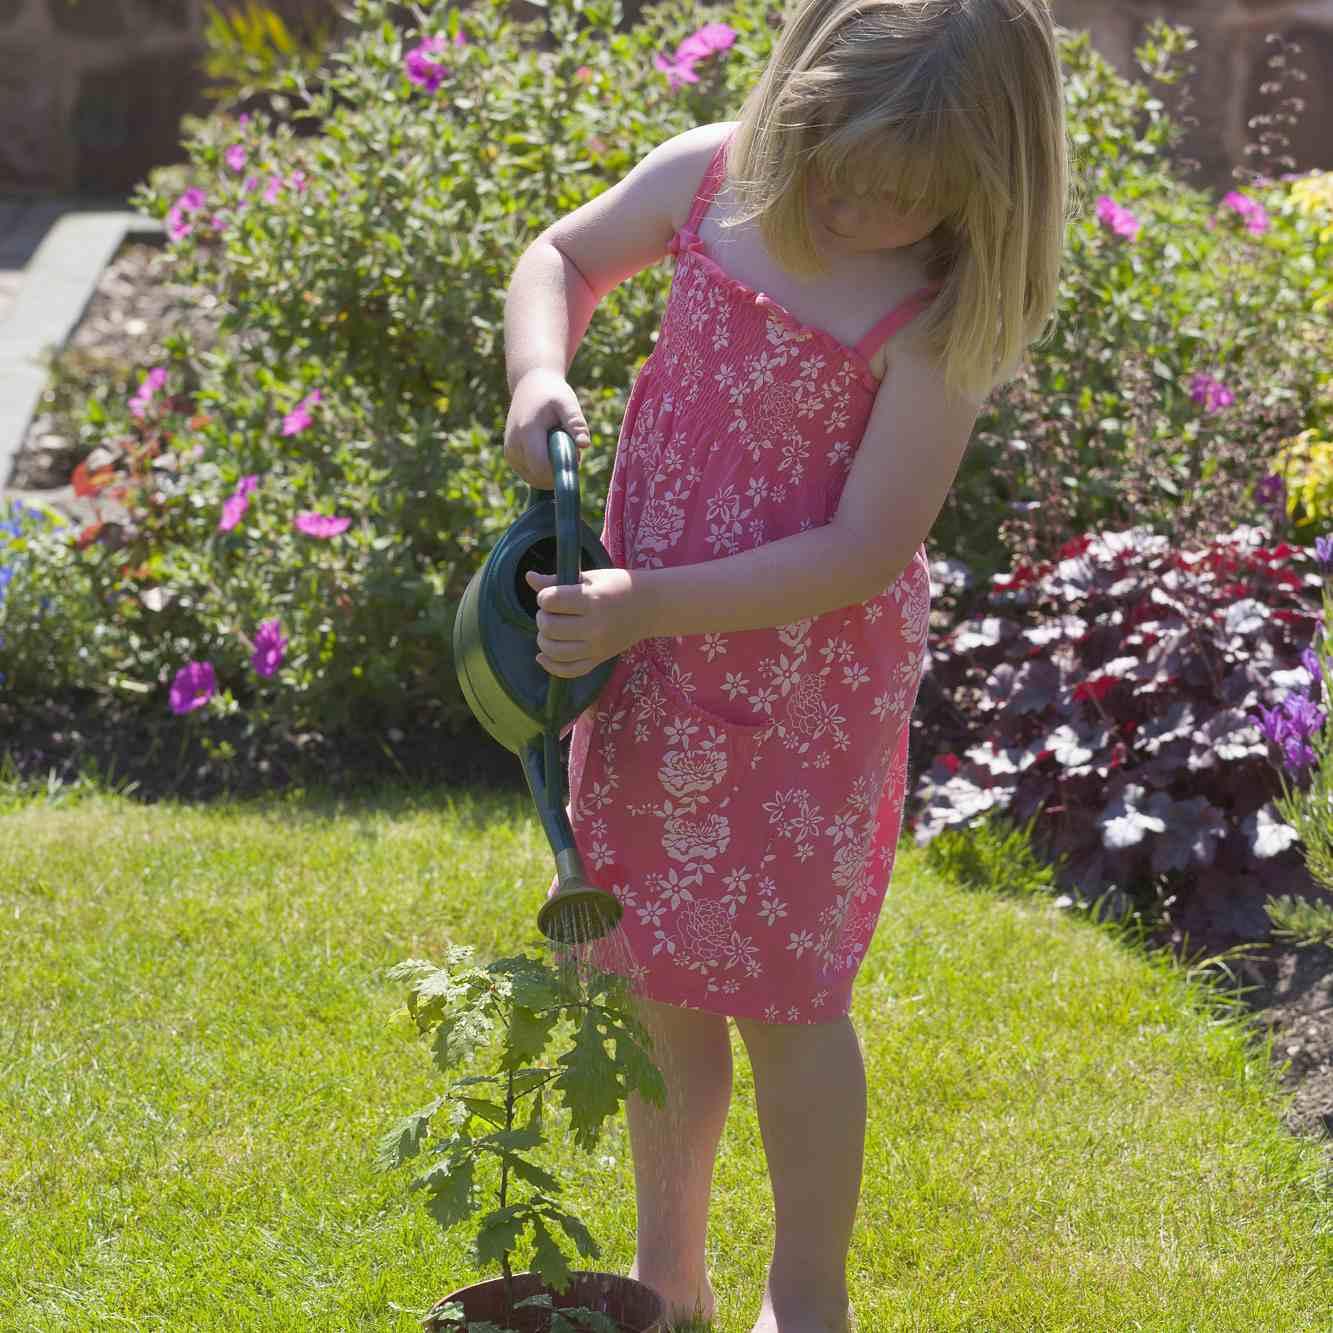 girl watering small tree